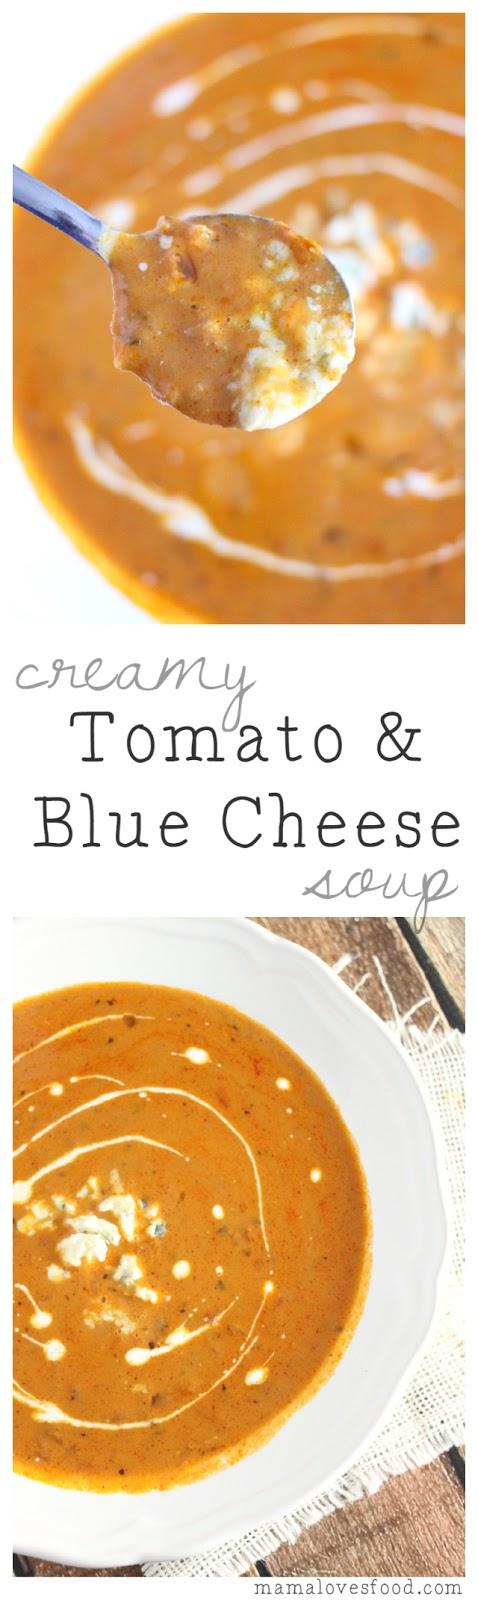 Creamy Tomato and Blue Cheese Soup Recipe